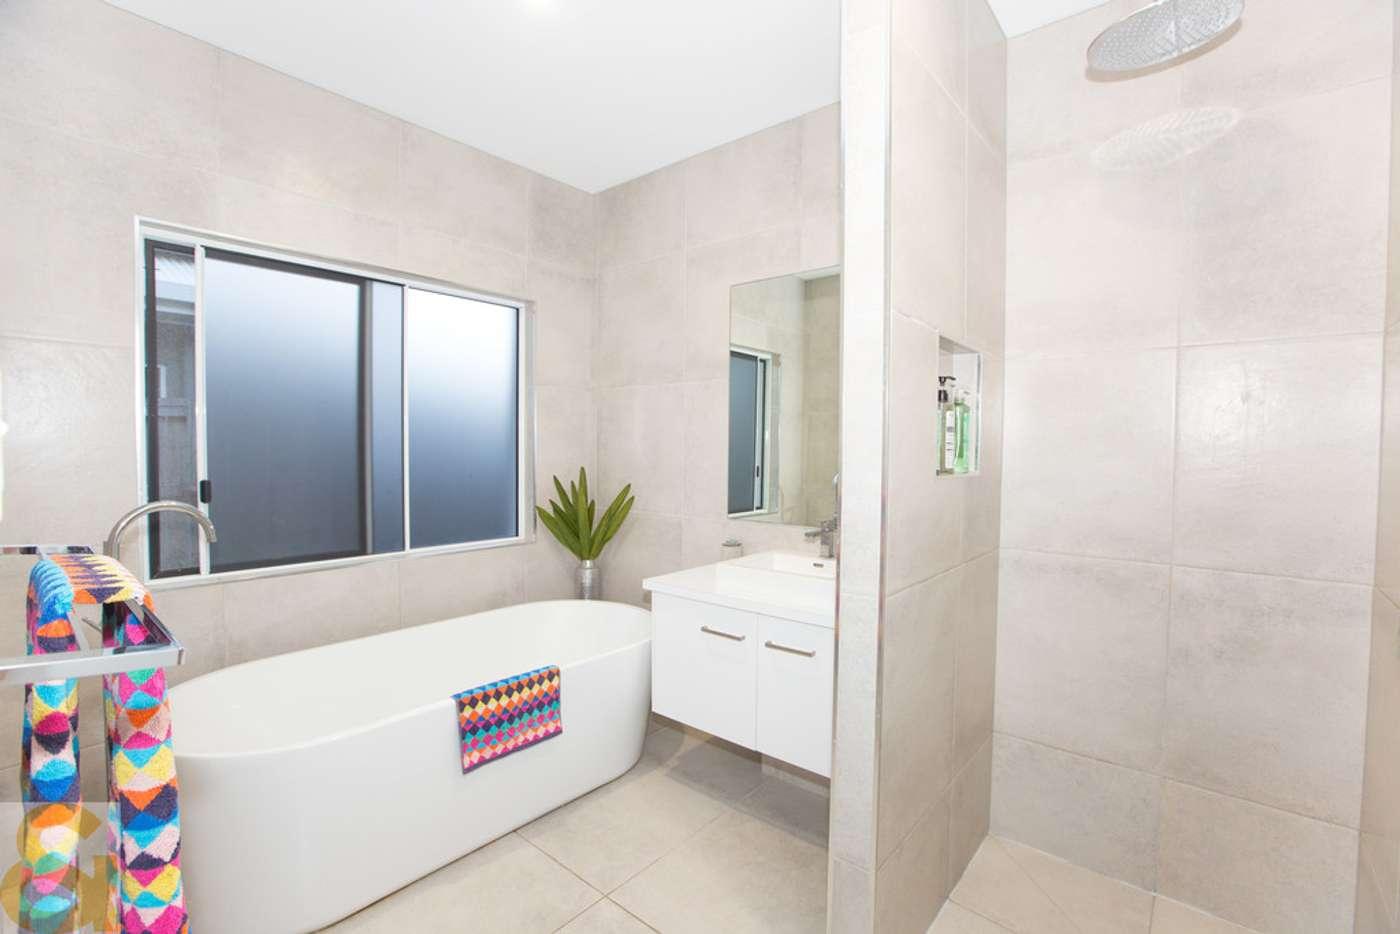 Sixth view of Homely house listing, 4 JULAJI CLOSE, Cooya Beach QLD 4873